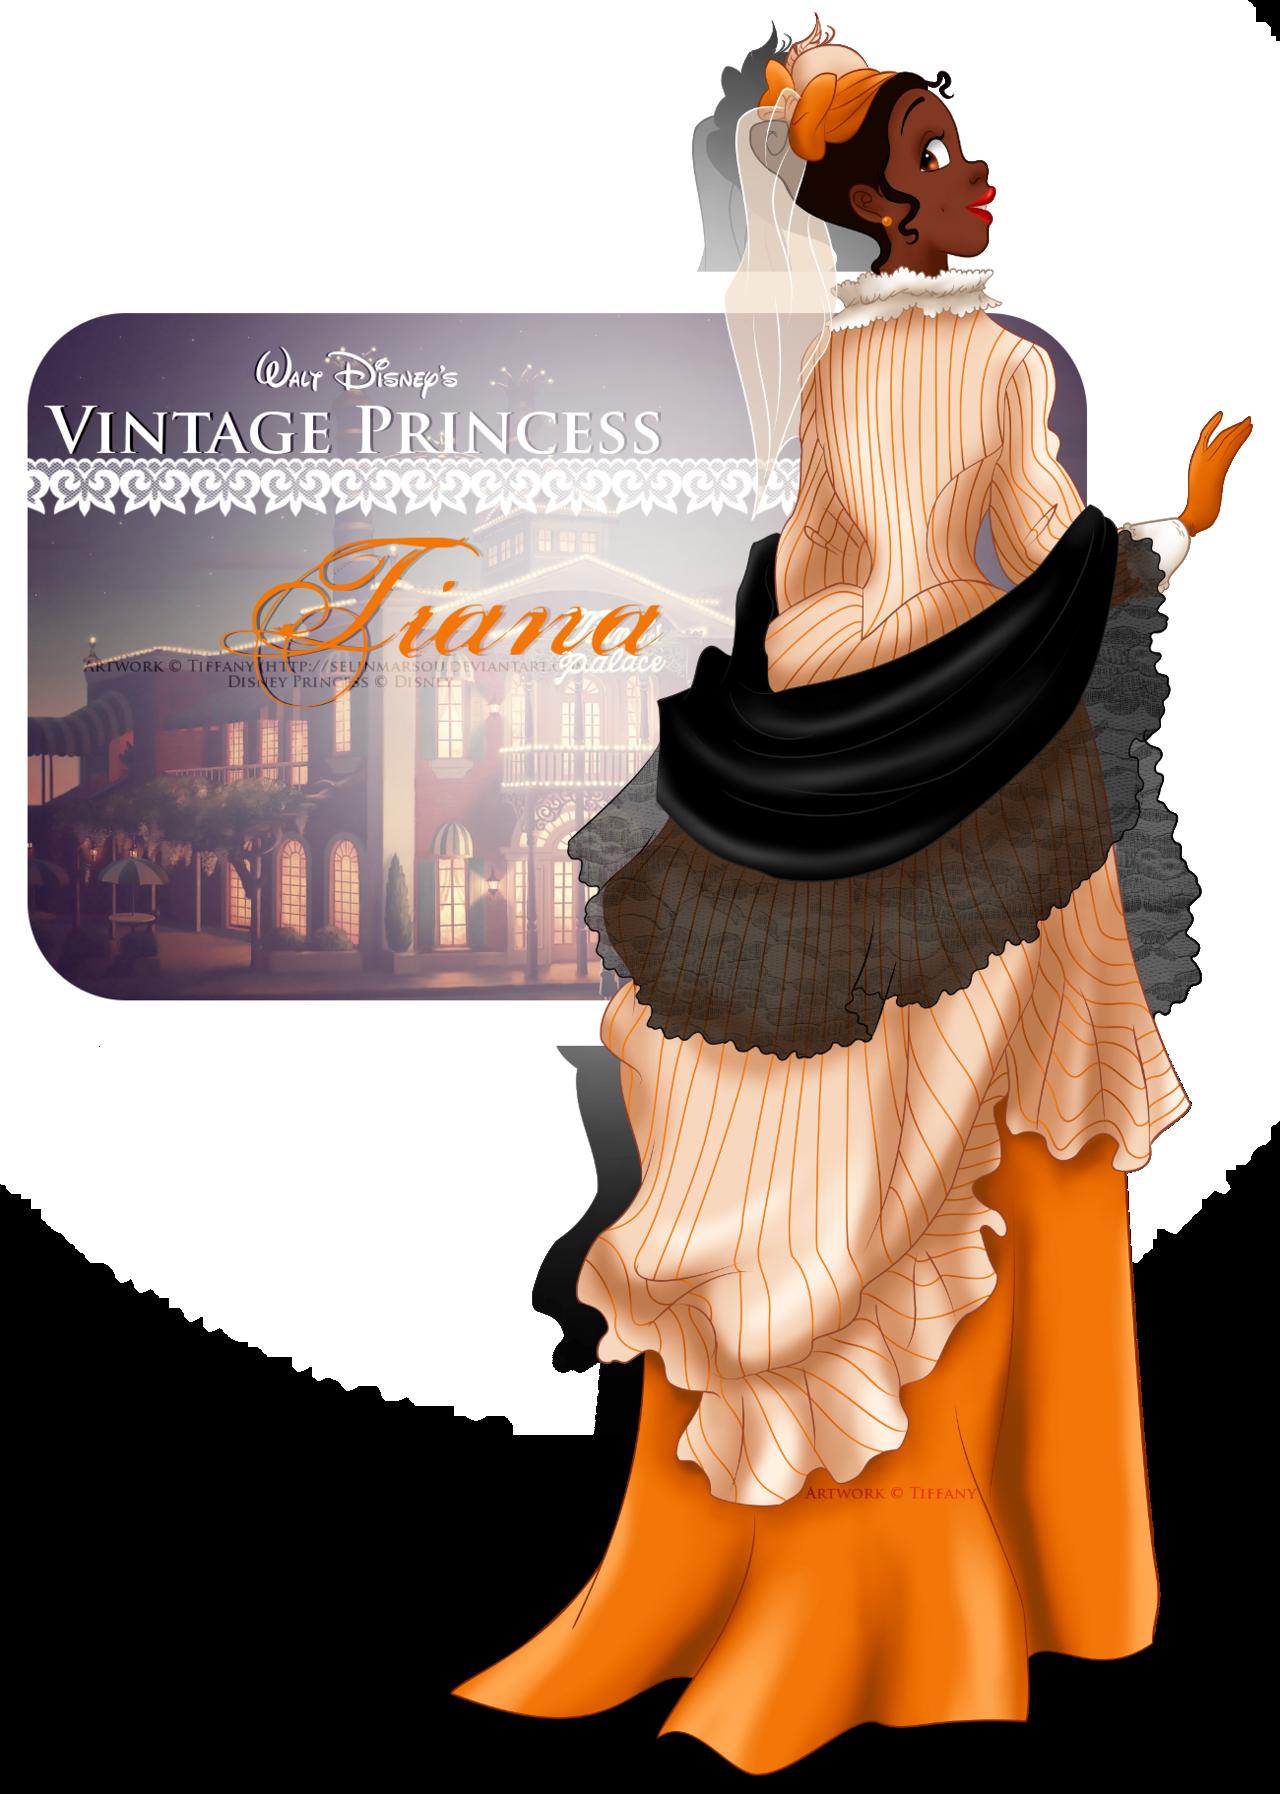 Vintage Princess -Tiana by selinmarsou.deviantart.com on @deviantART